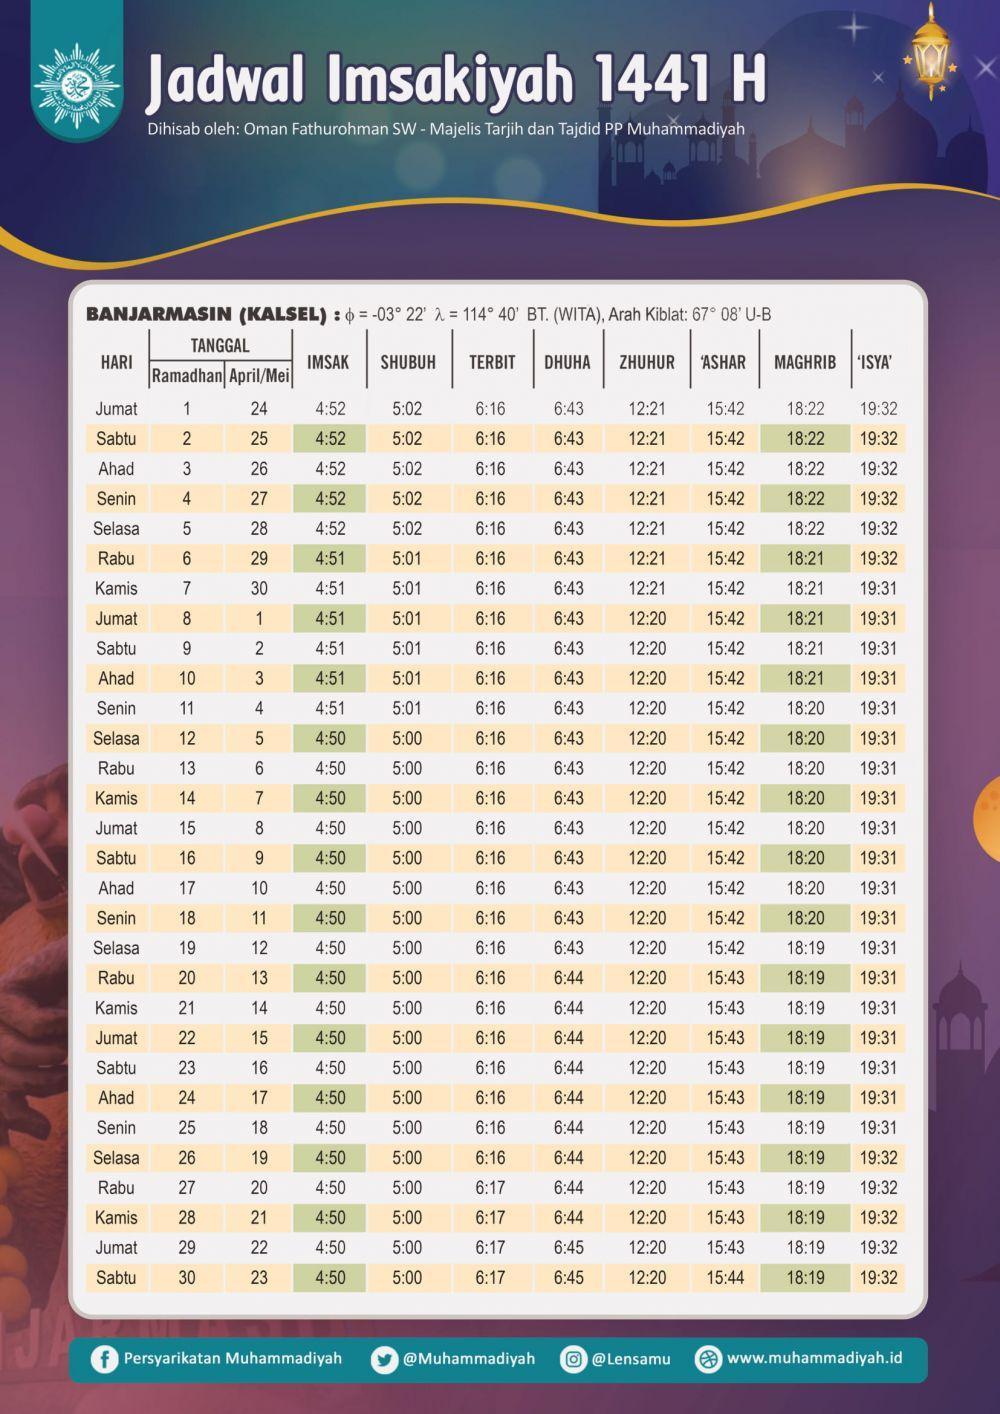 Jadwal Imsyakiyah 144 H Kota Banjarmasin Kalimantan Selatan 2.jpg